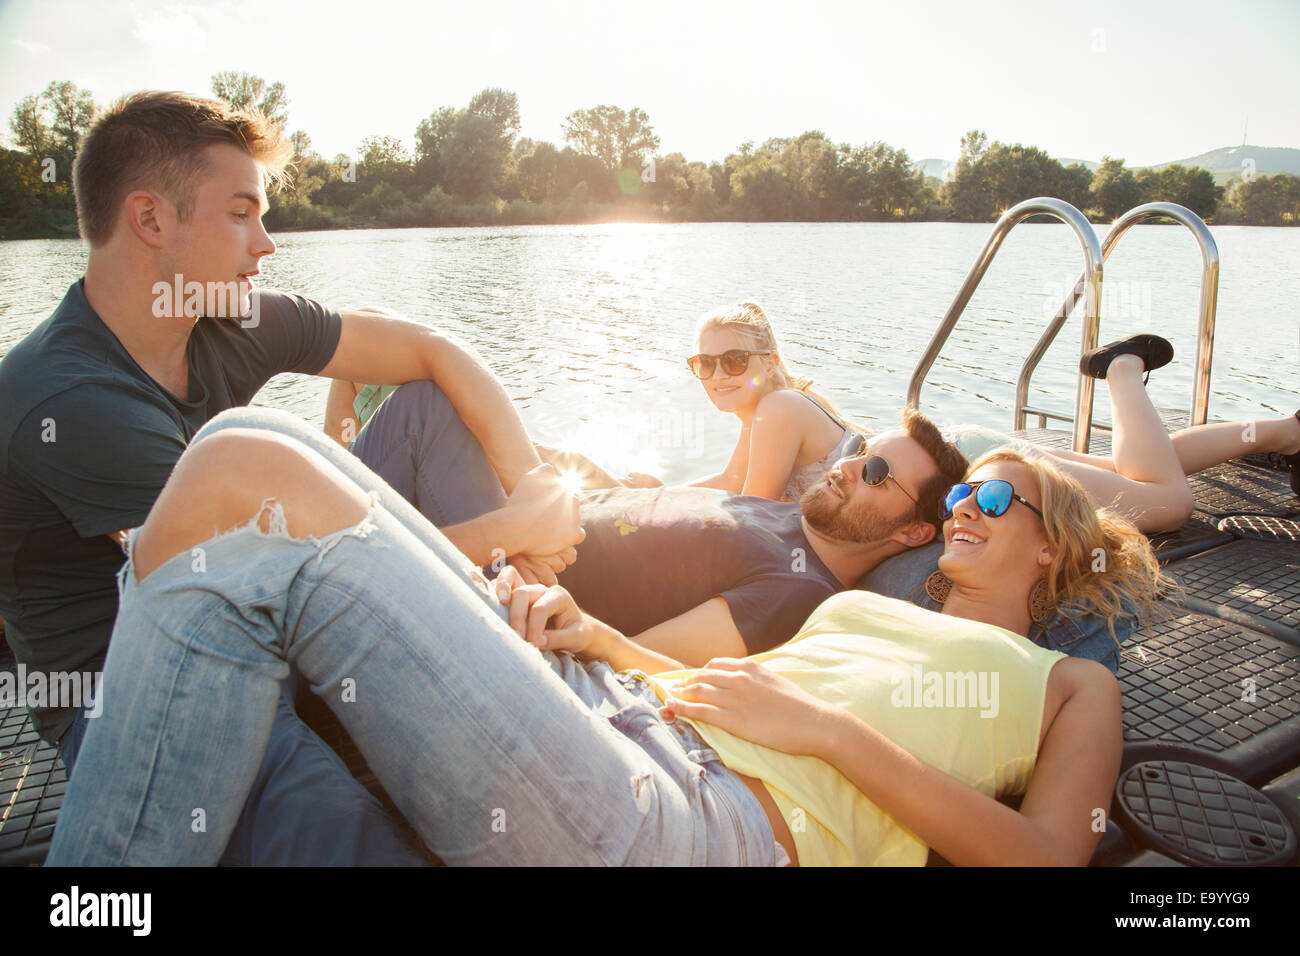 Vier junge Erwachsene Freunde im Chat am Flussufer pier Stockbild